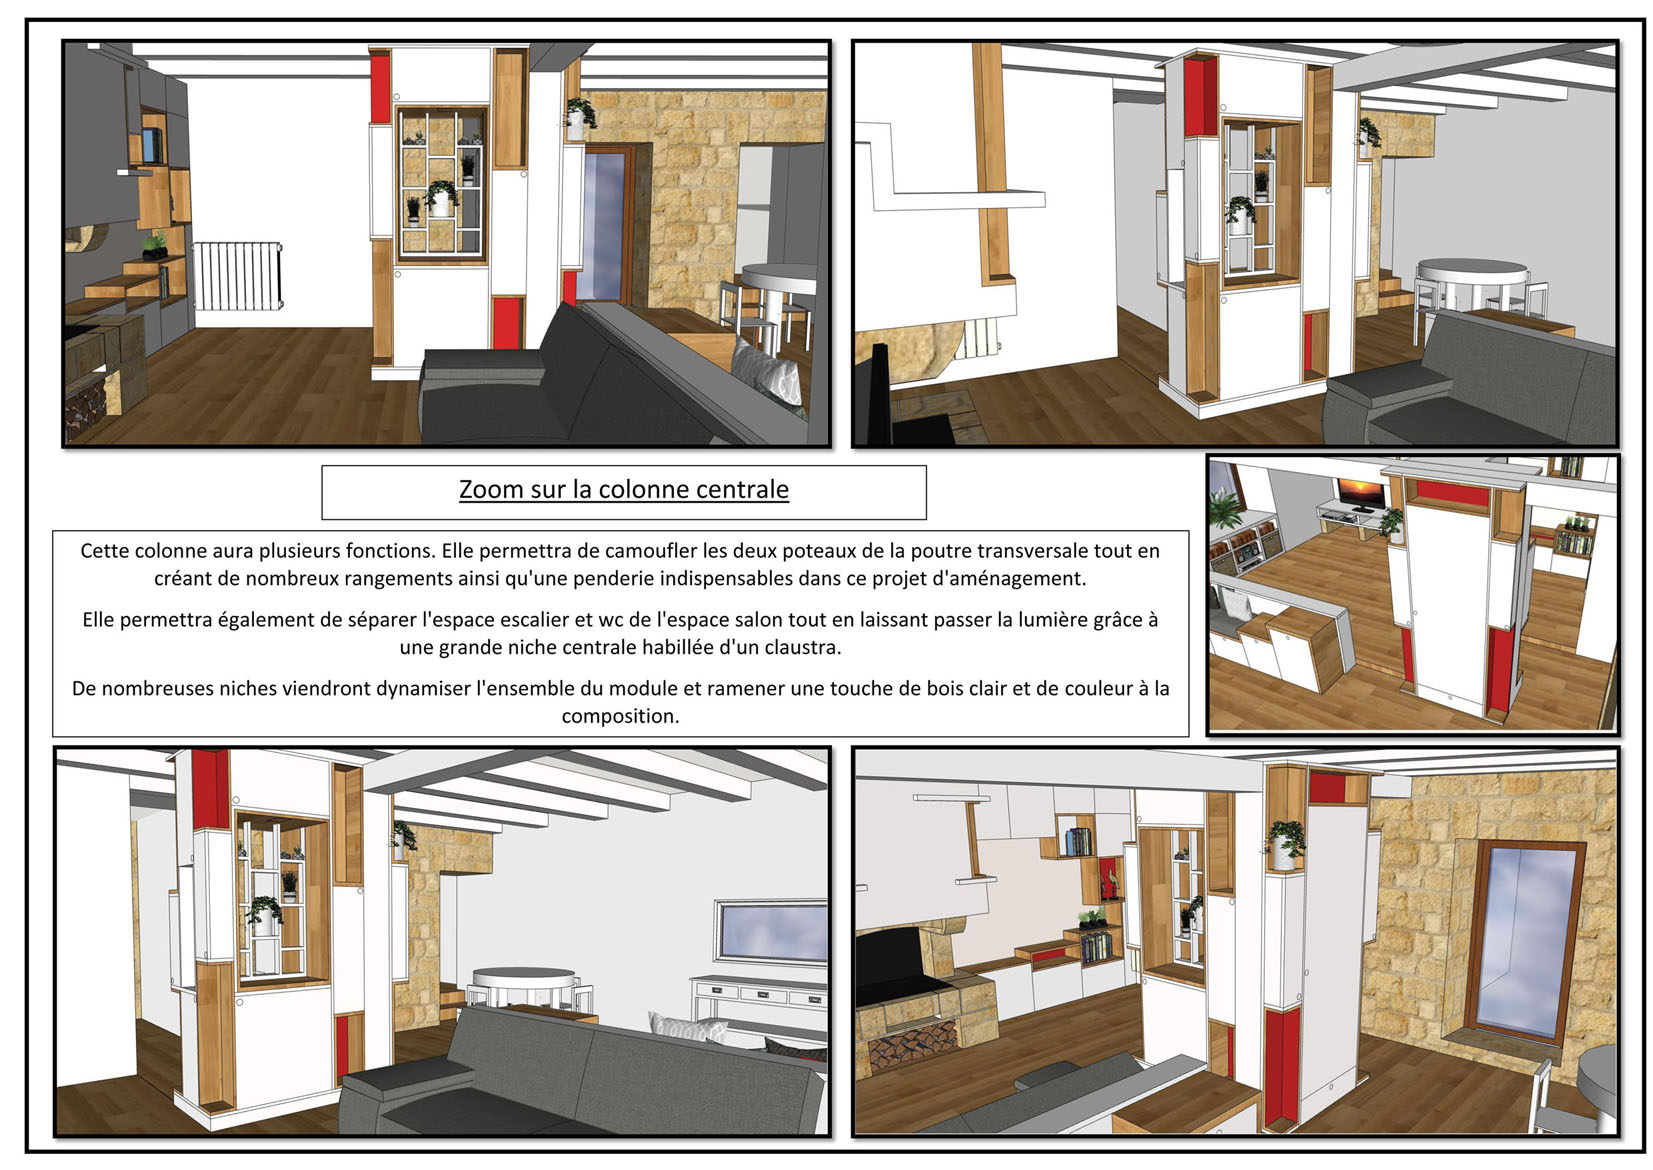 projet aménagement 3 D